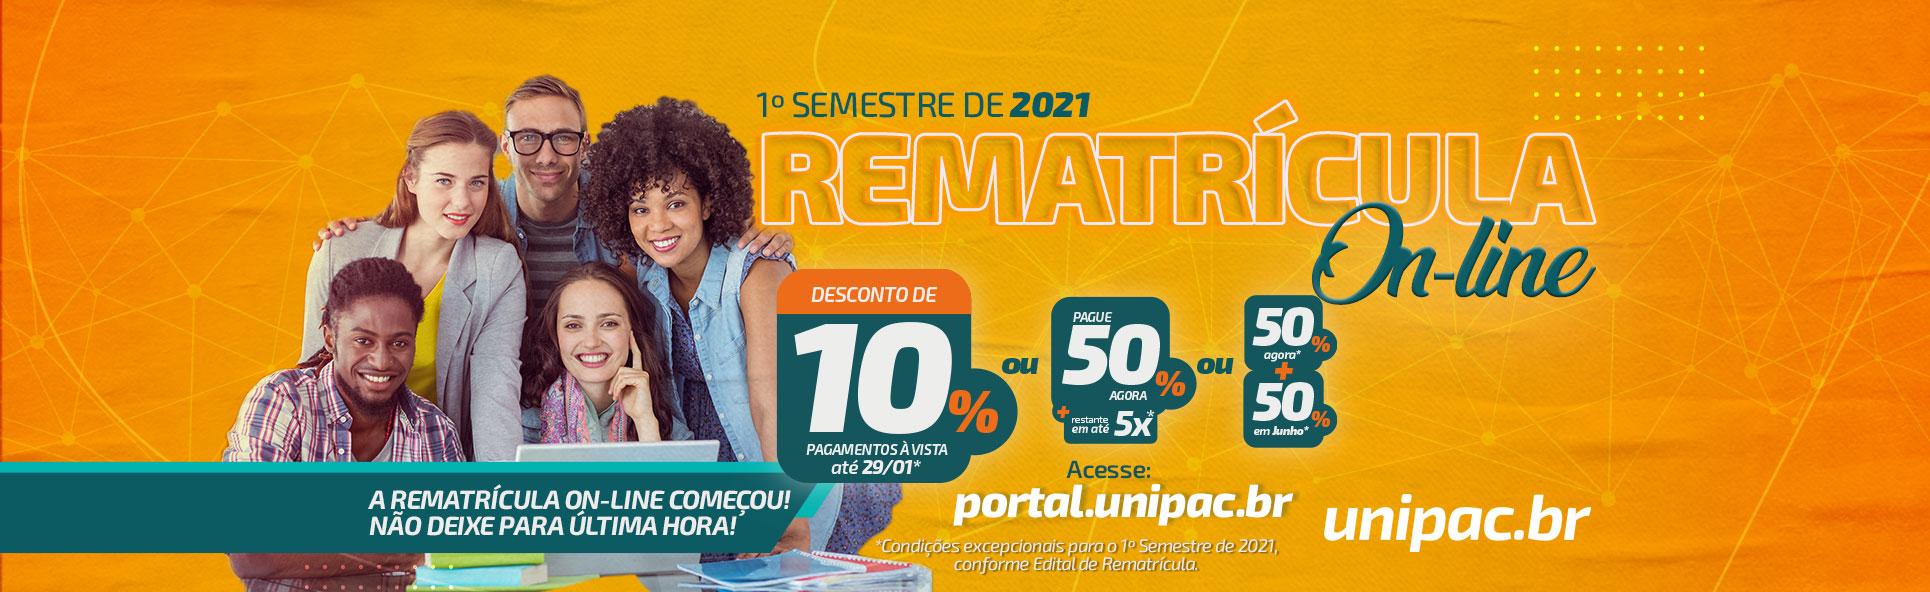 Rematrícula On-line – 12/01/2021 – desktop